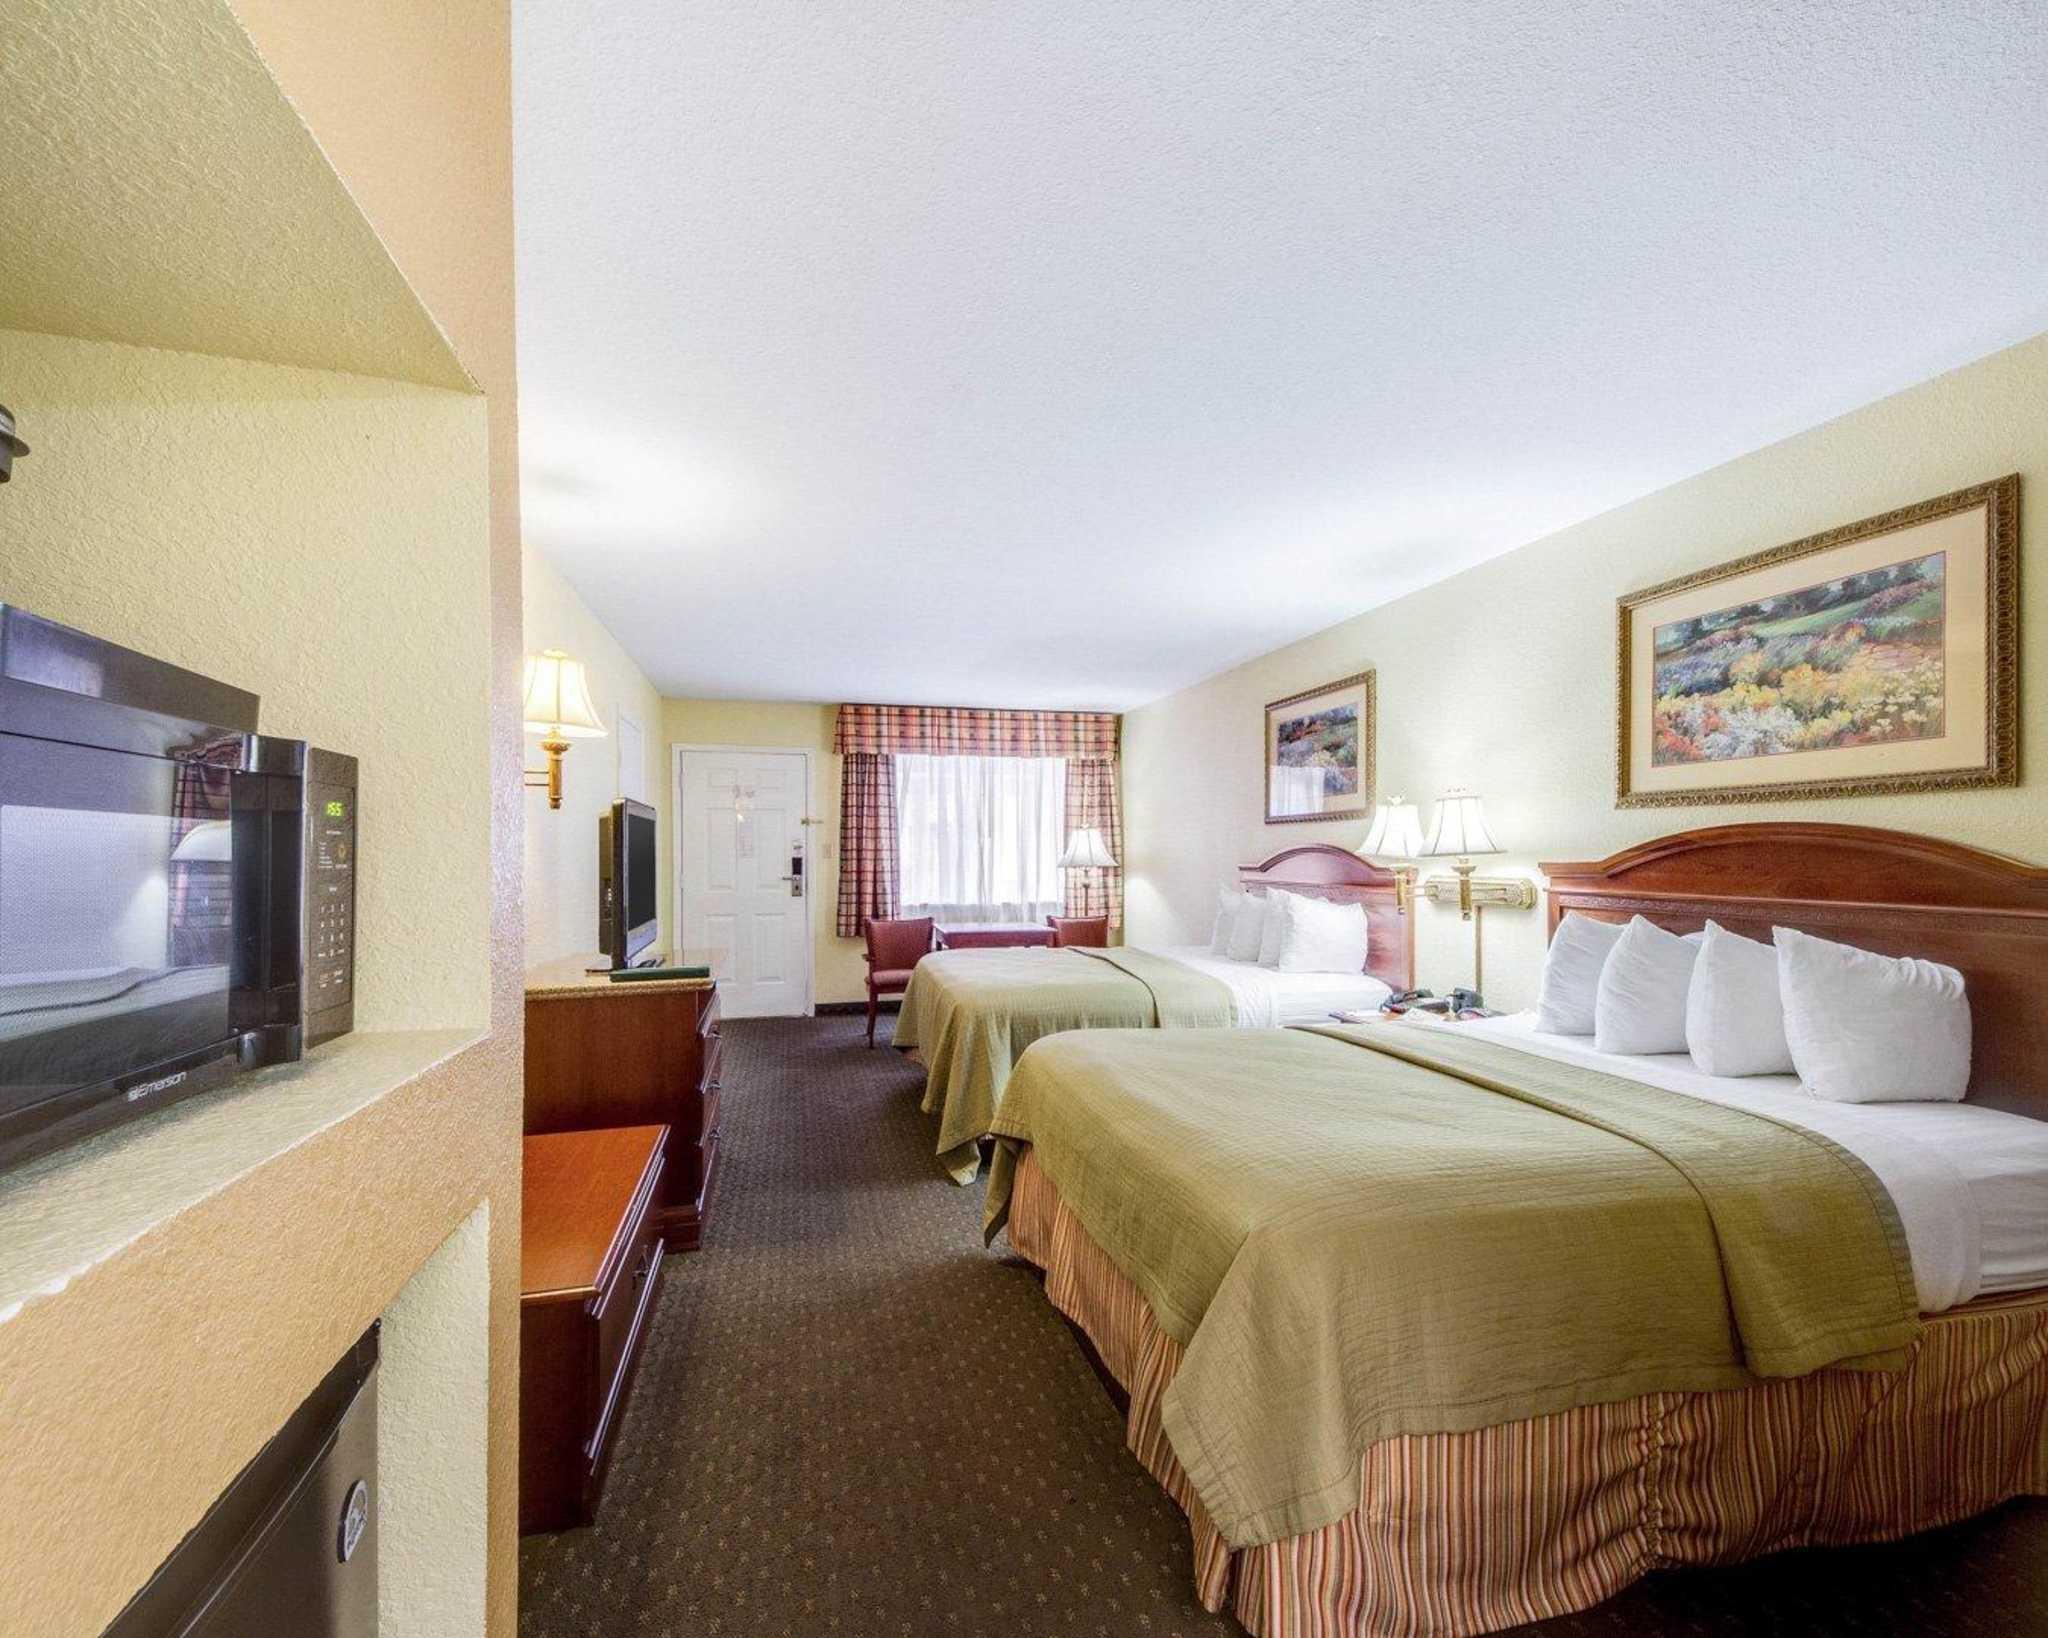 Quality Inn & Suites Eagle Pass image 6